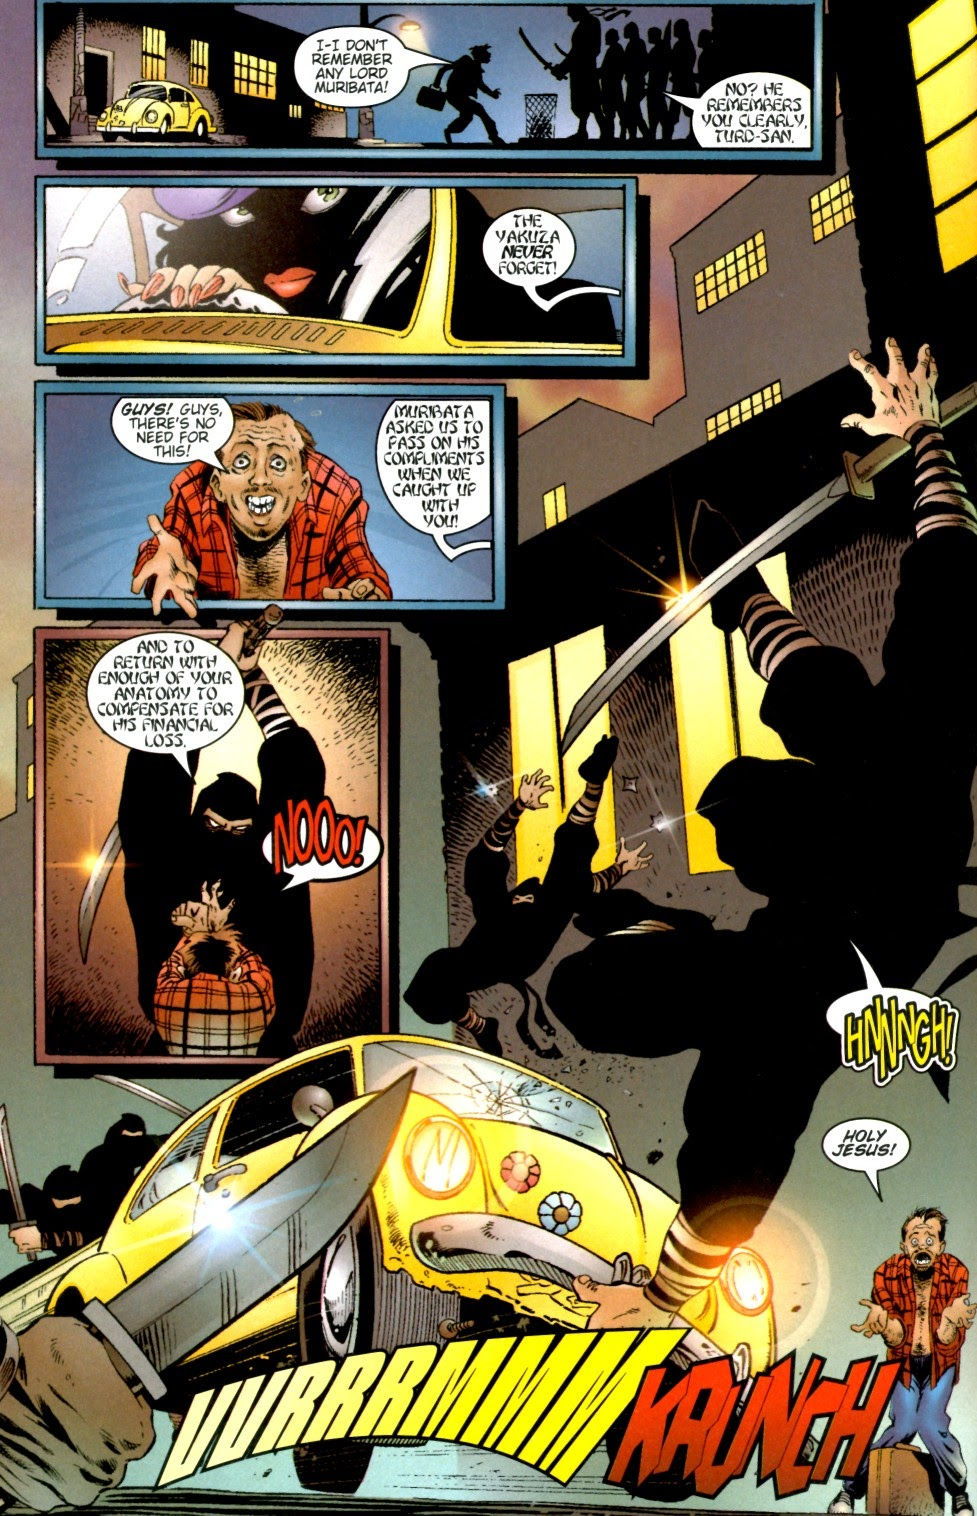 Painkiller Jane vs The Darkness Full | Viewcomic reading comics online for free 2021